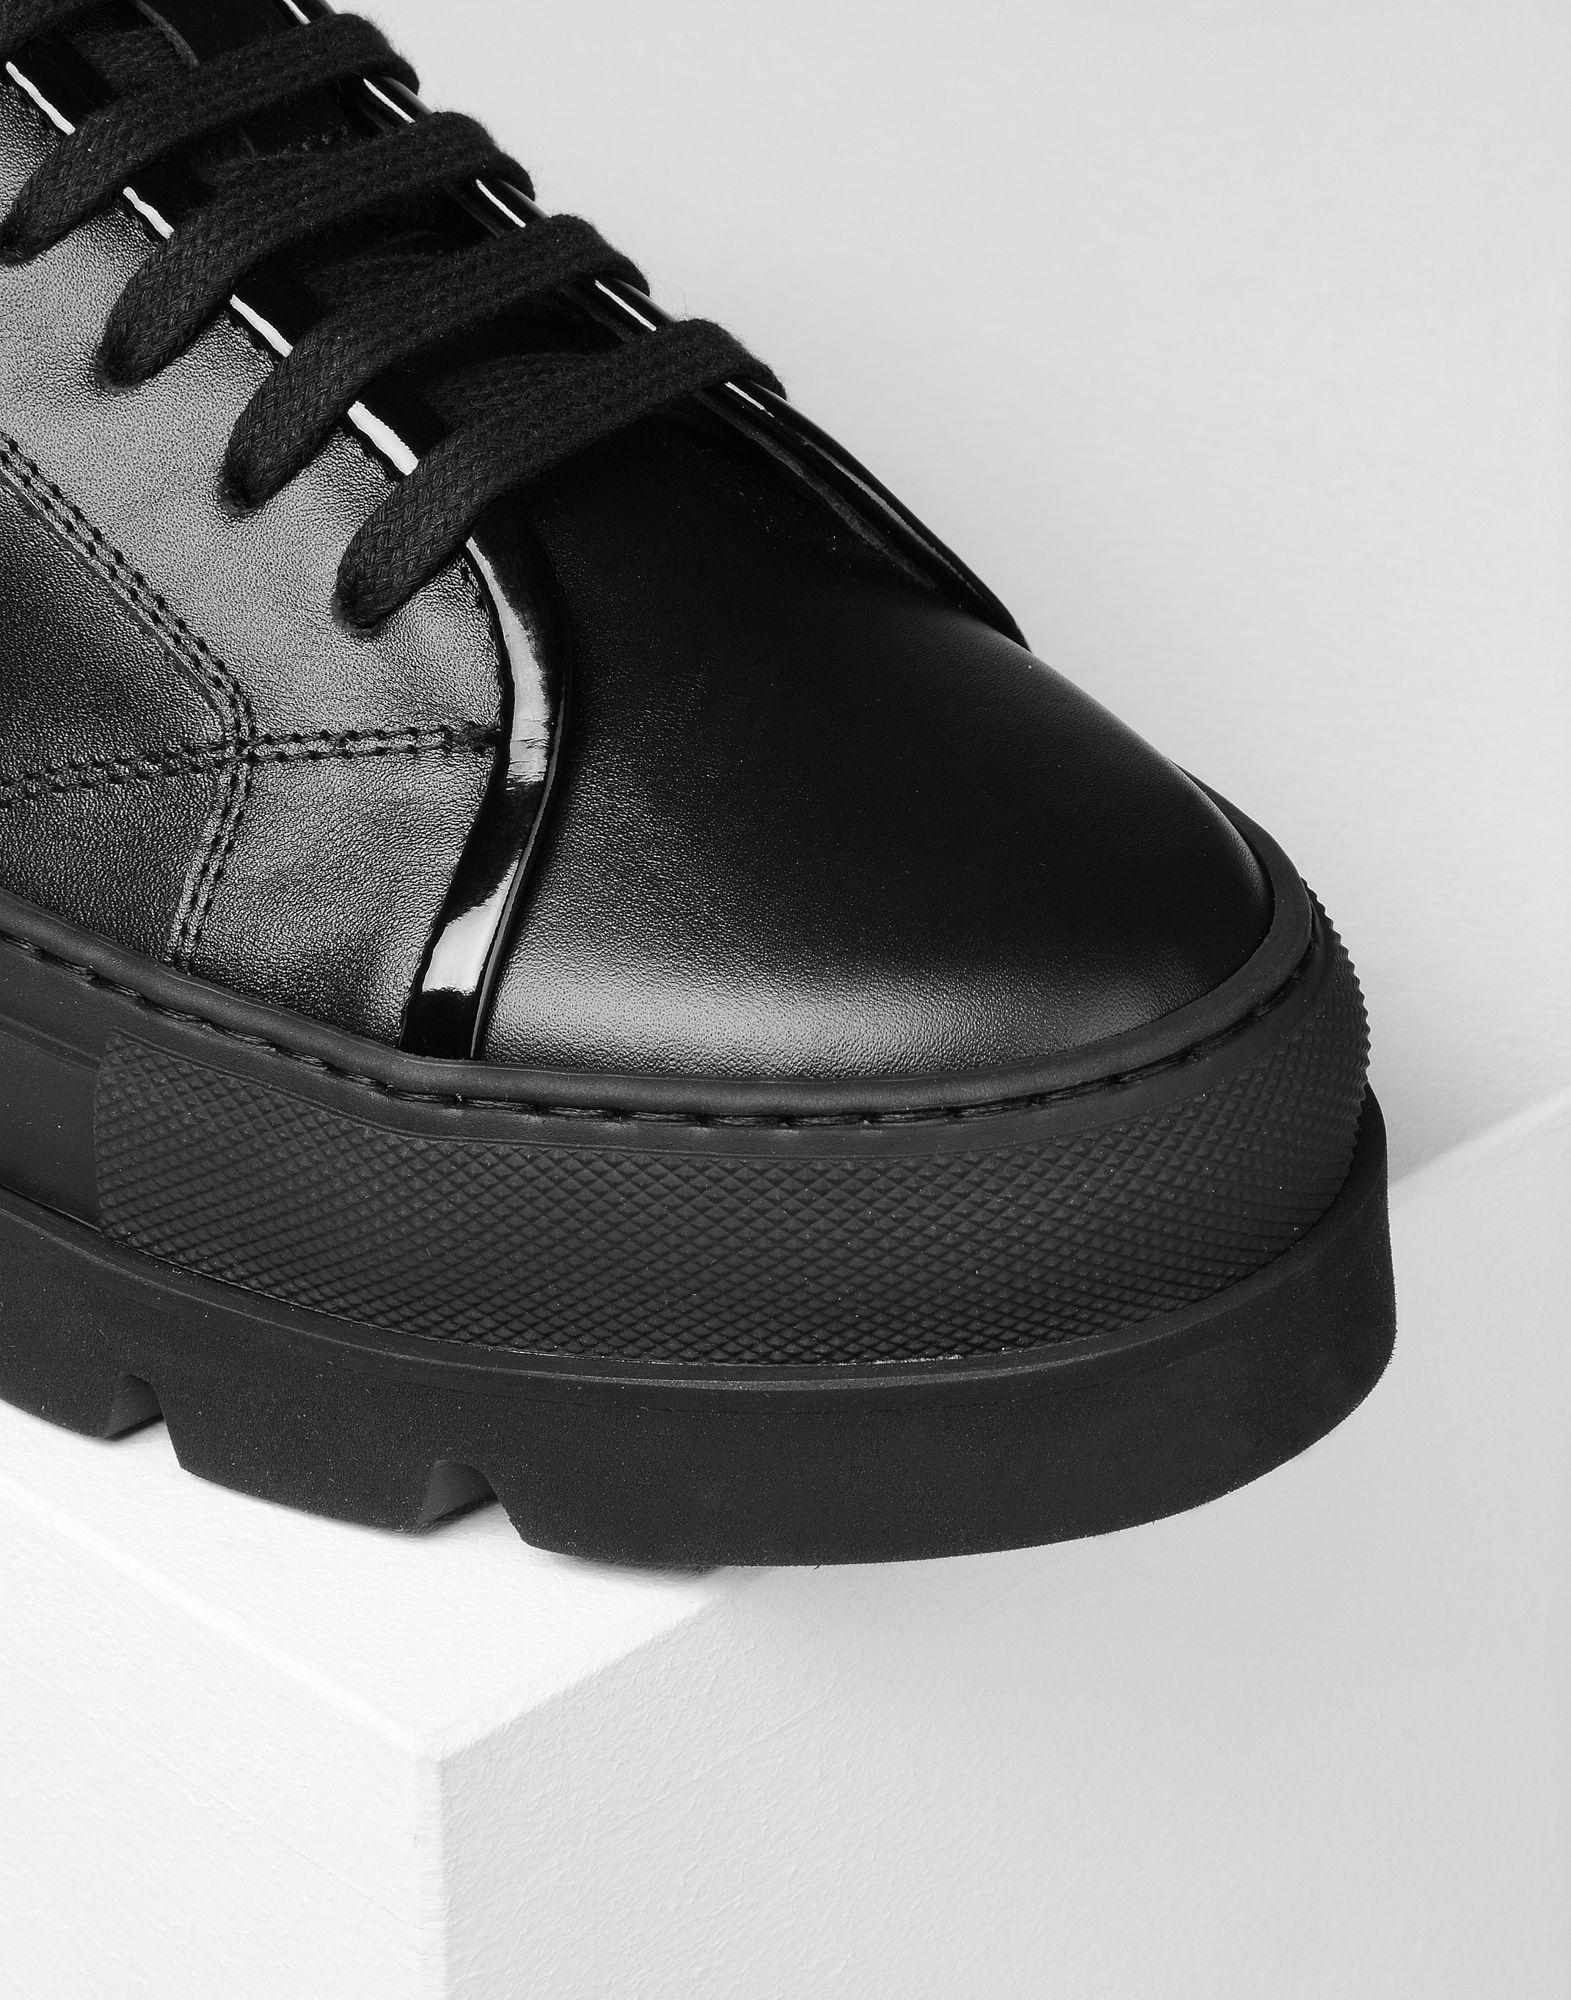 MM6 by Maison Martin Margiela 'monster' Sneakers in Black